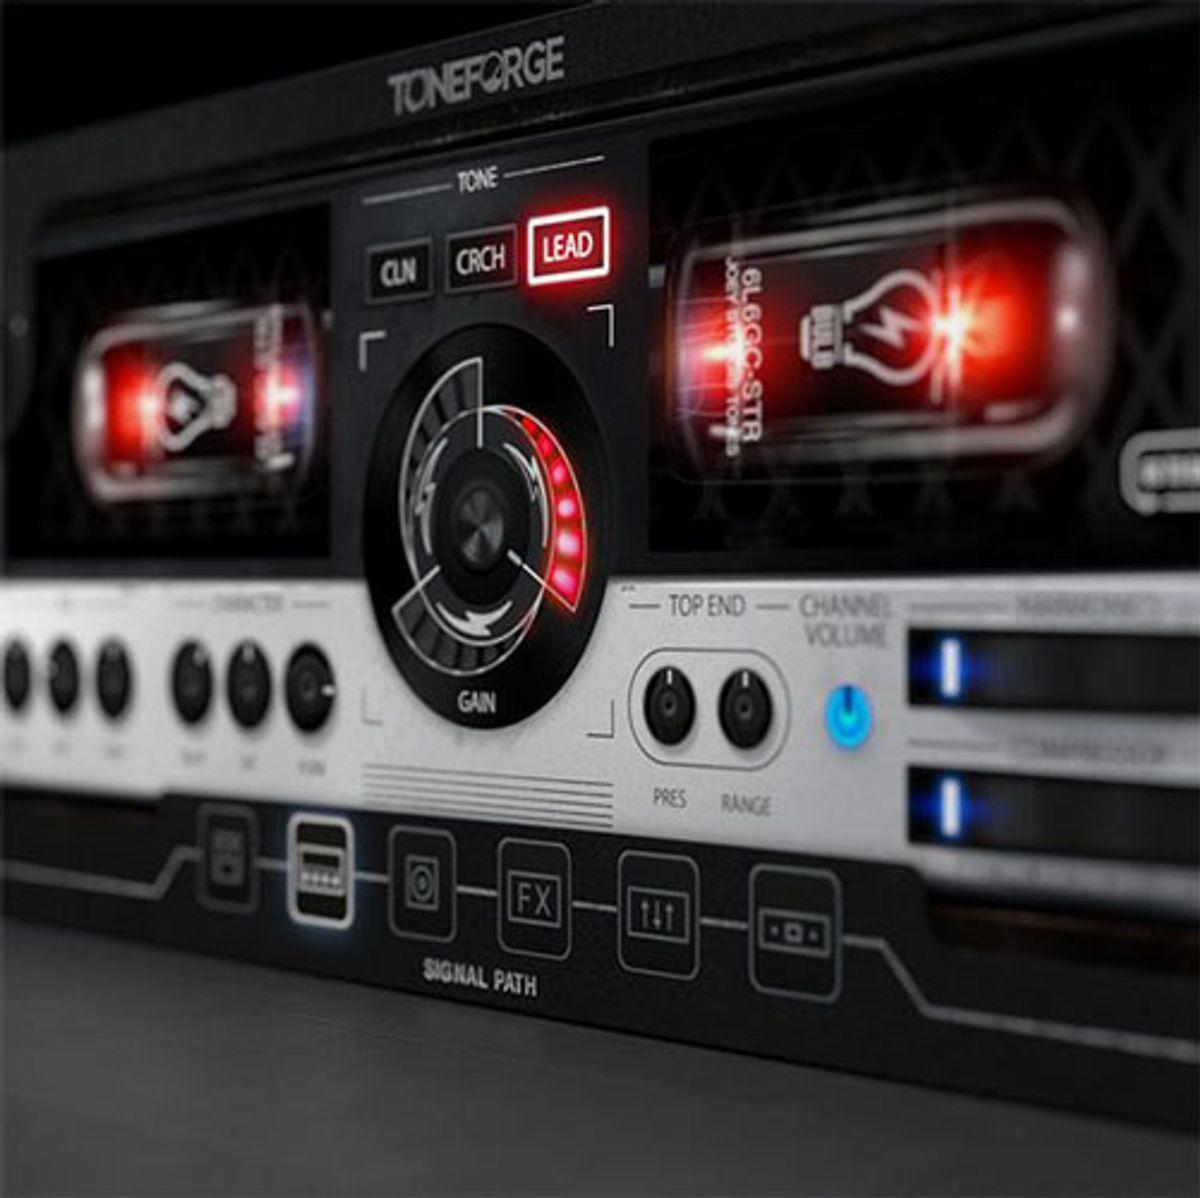 Joey Sturgis Tones Partners with Misha Mansoor for Toneforge Plug-In